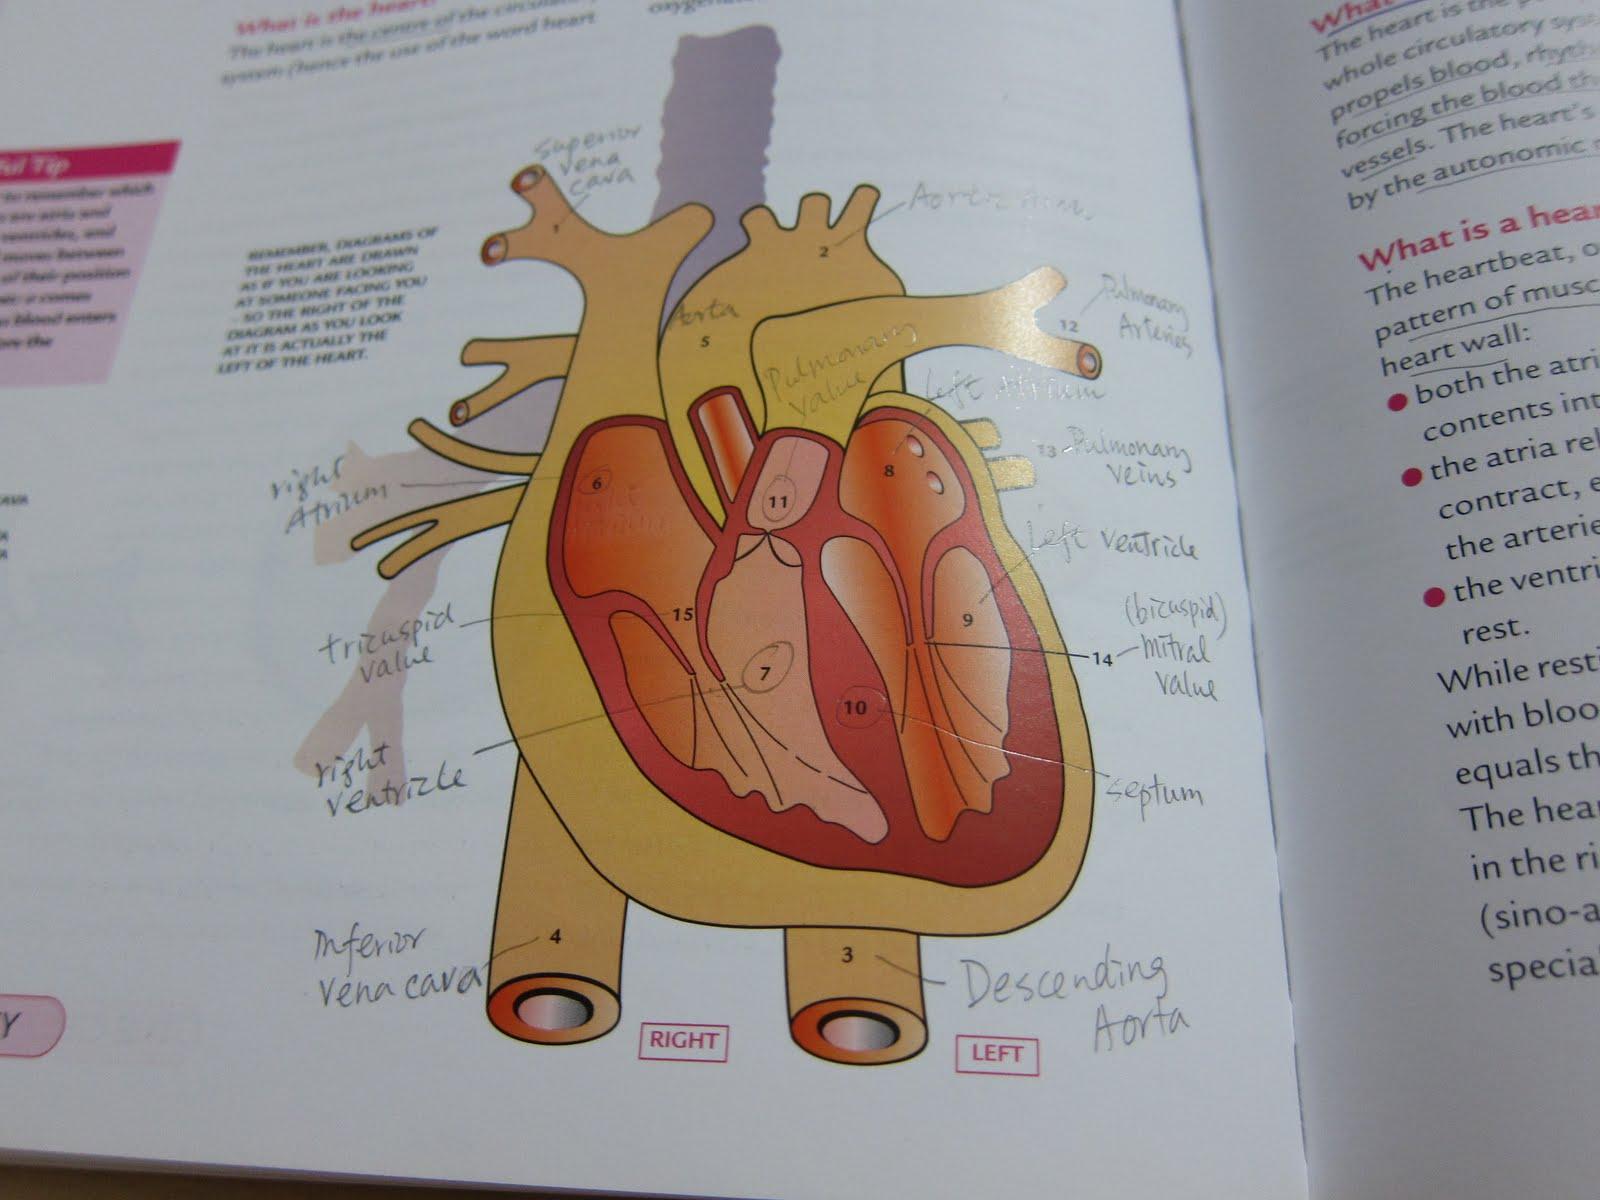 Heart Whispering: 溫習循環系統想到的